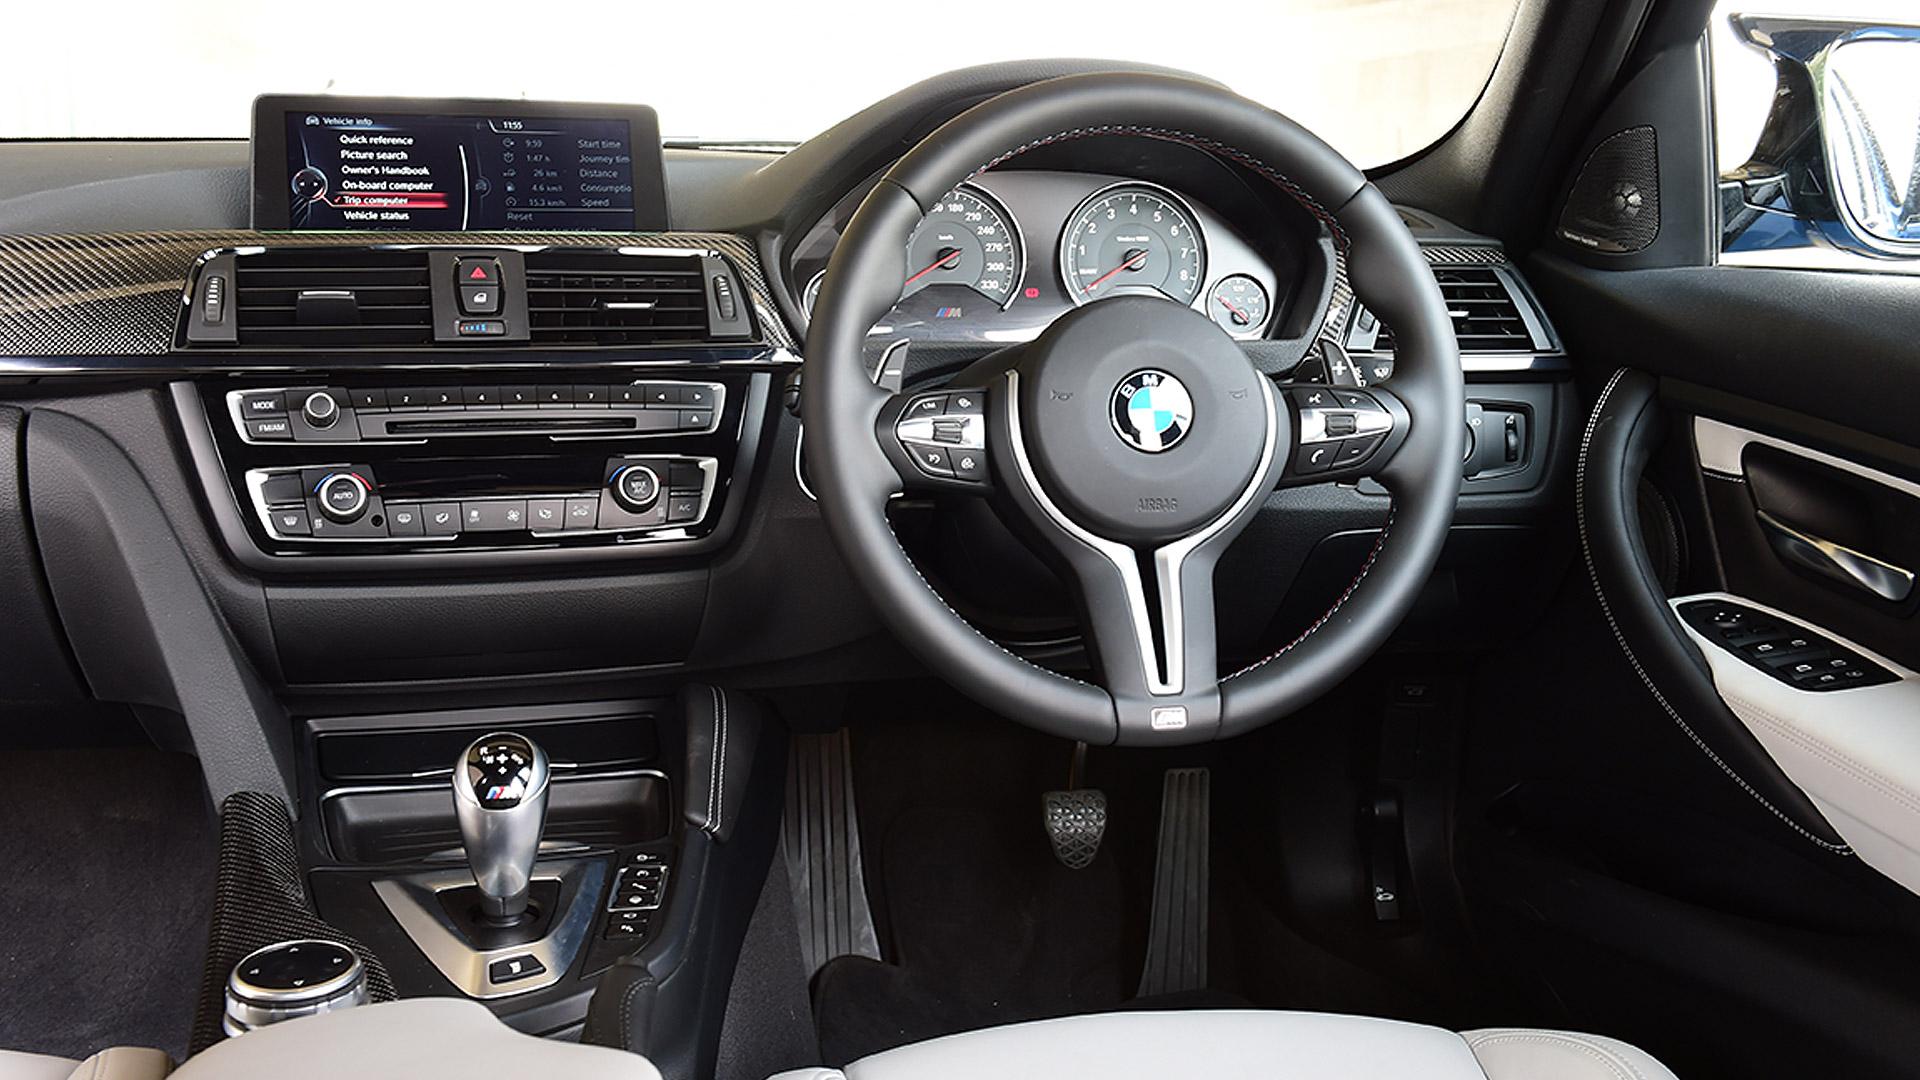 BMW M3 Sedan 2015 STD Interior